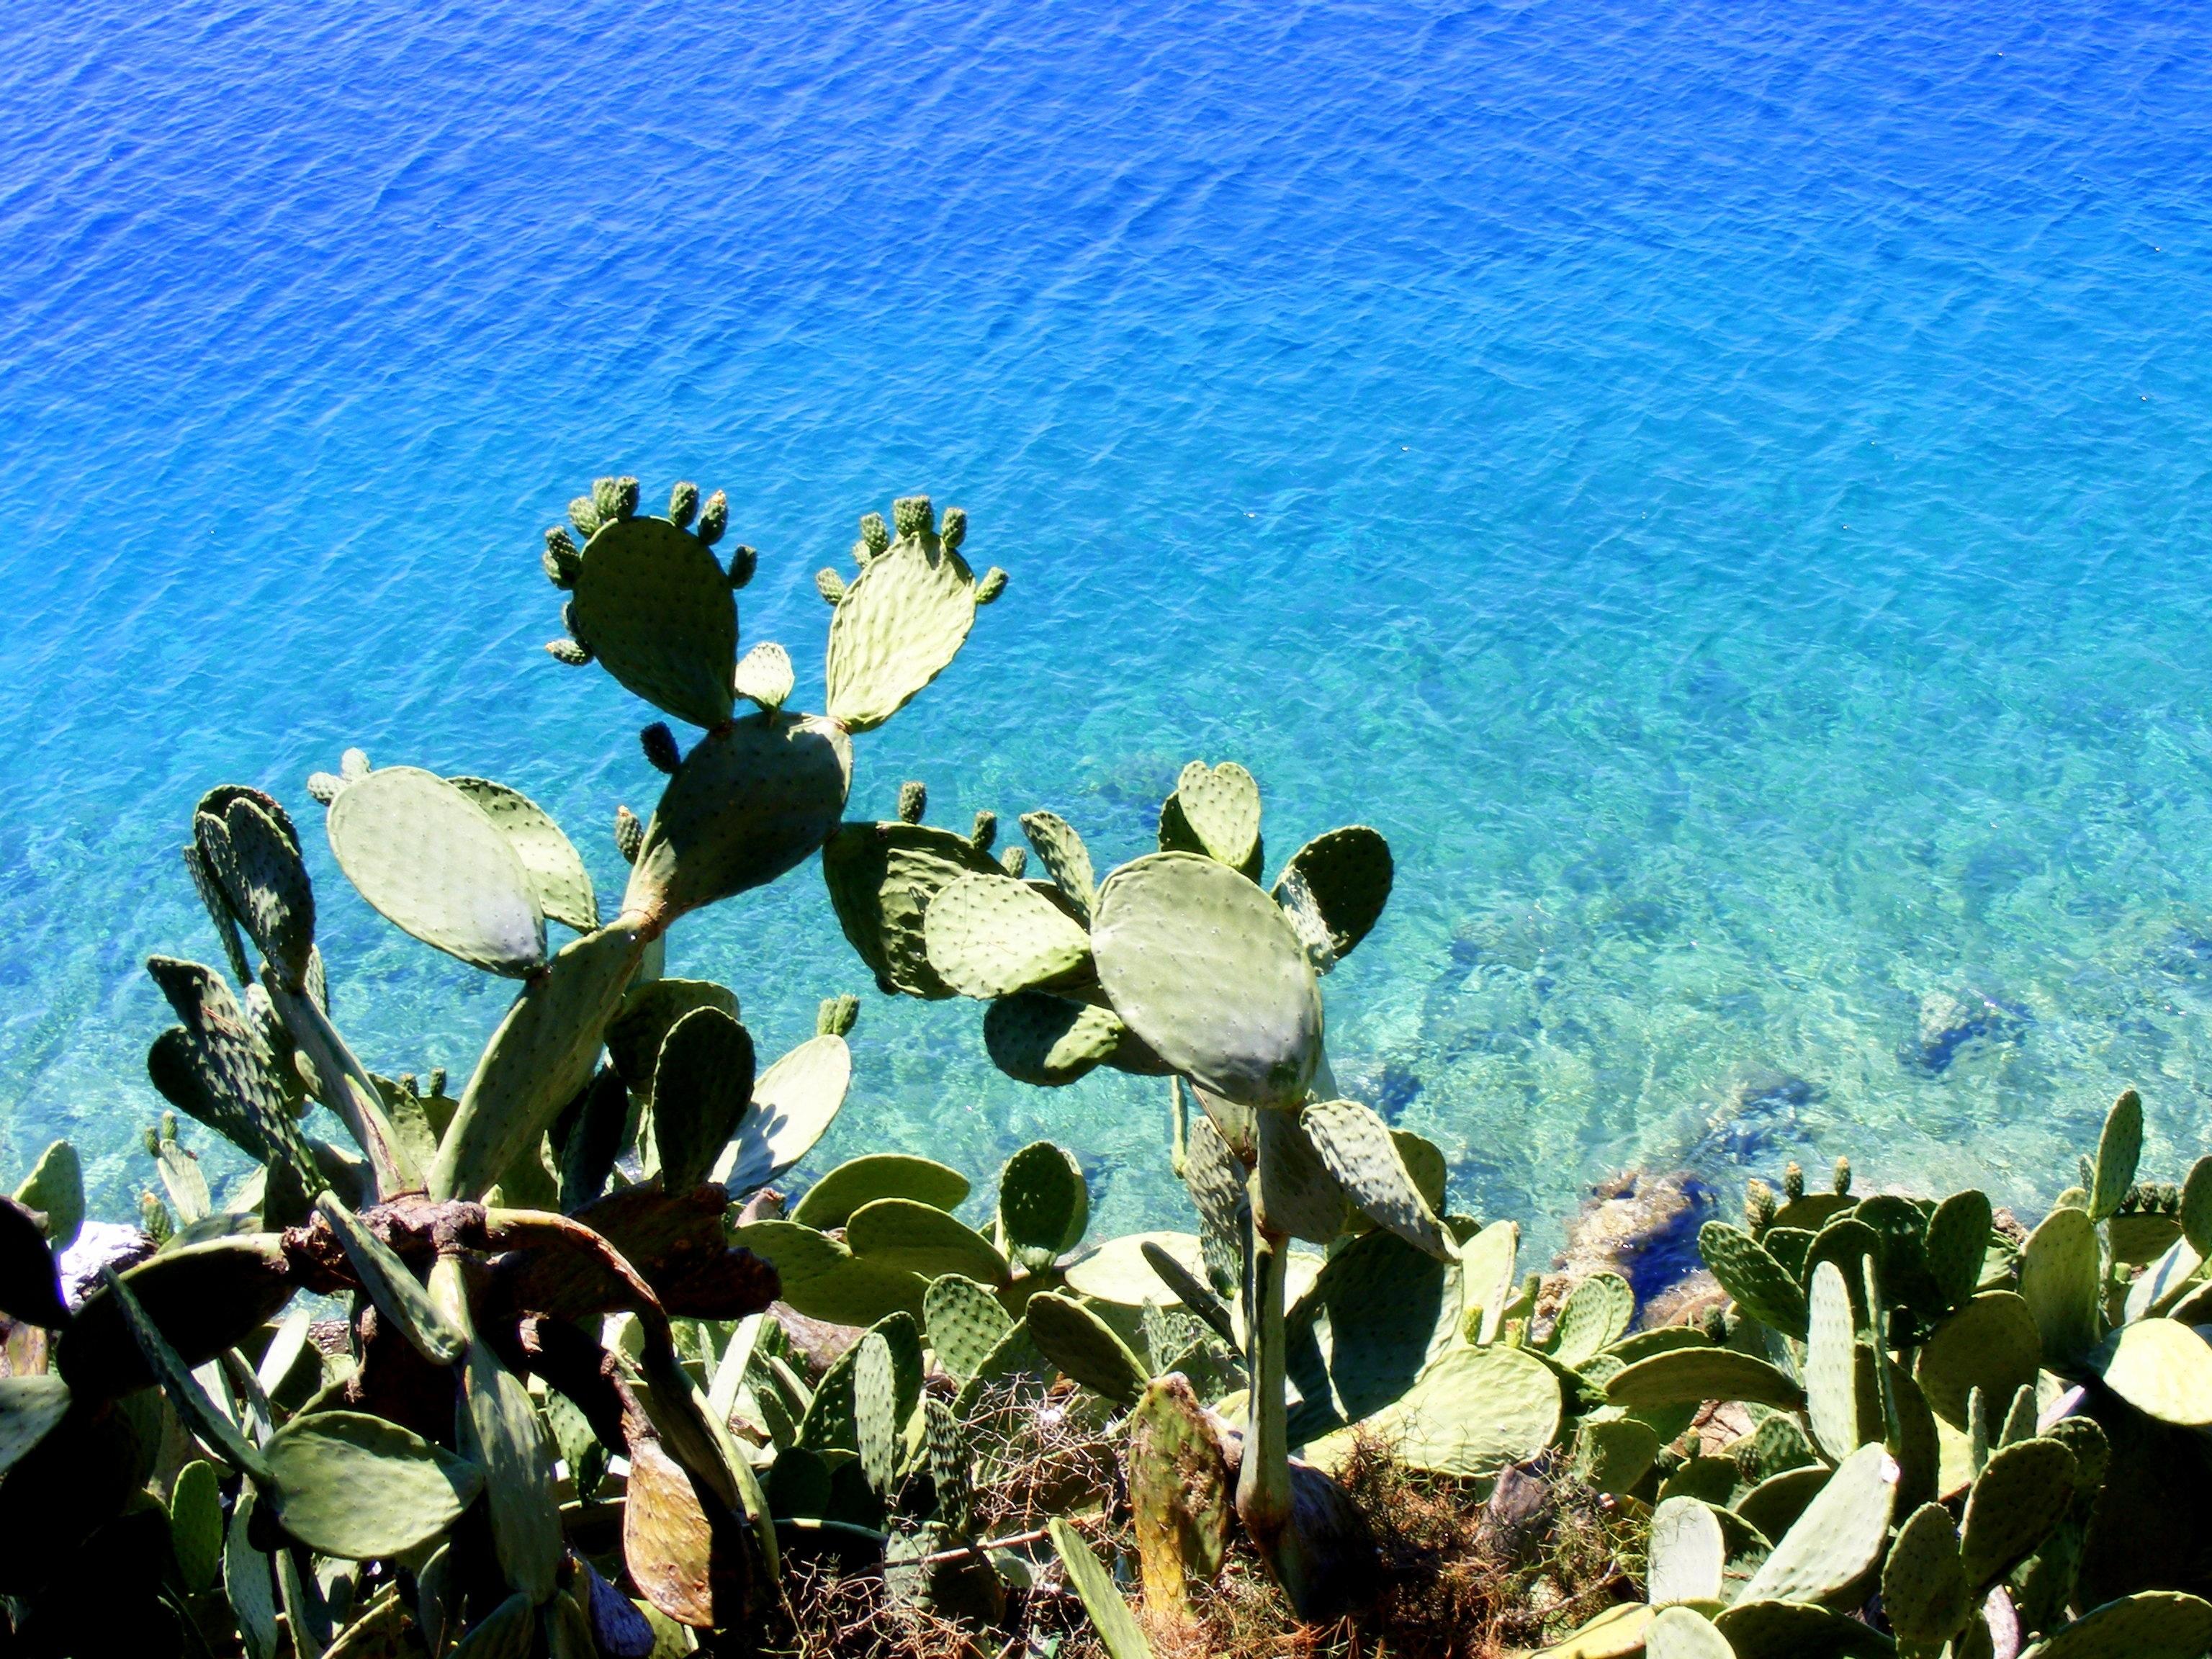 Cactus on the Shore, Blue, Cactus, Flow, Green, HQ Photo